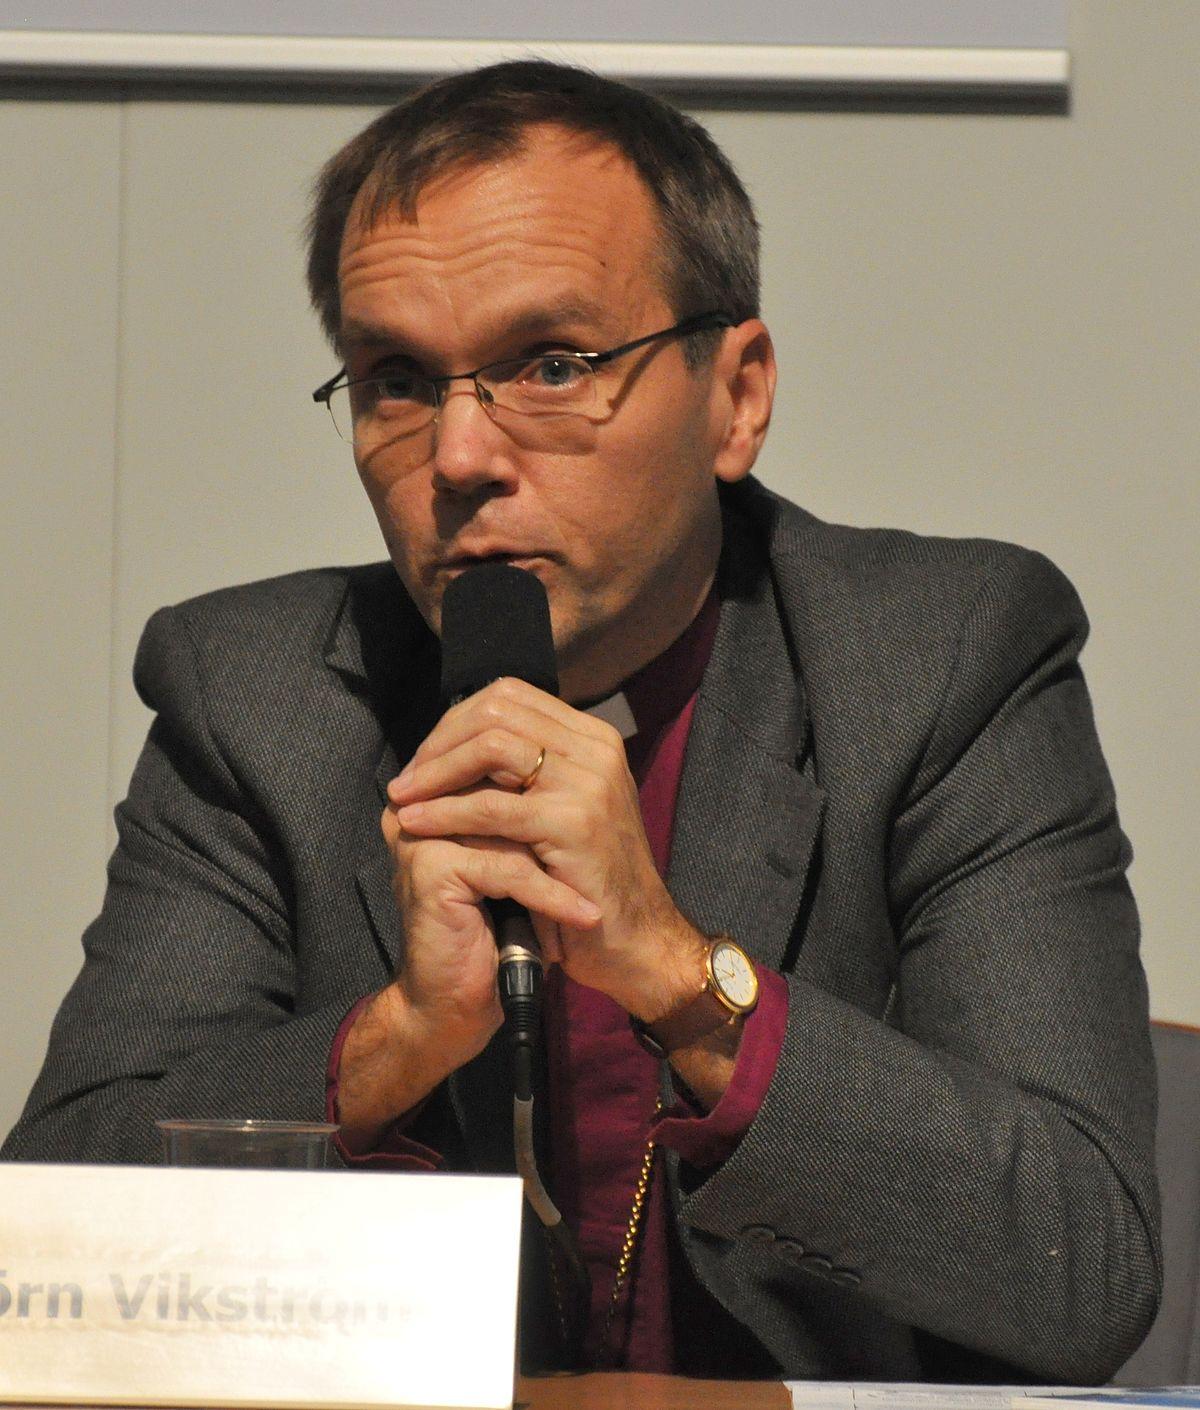 Björn Vikström